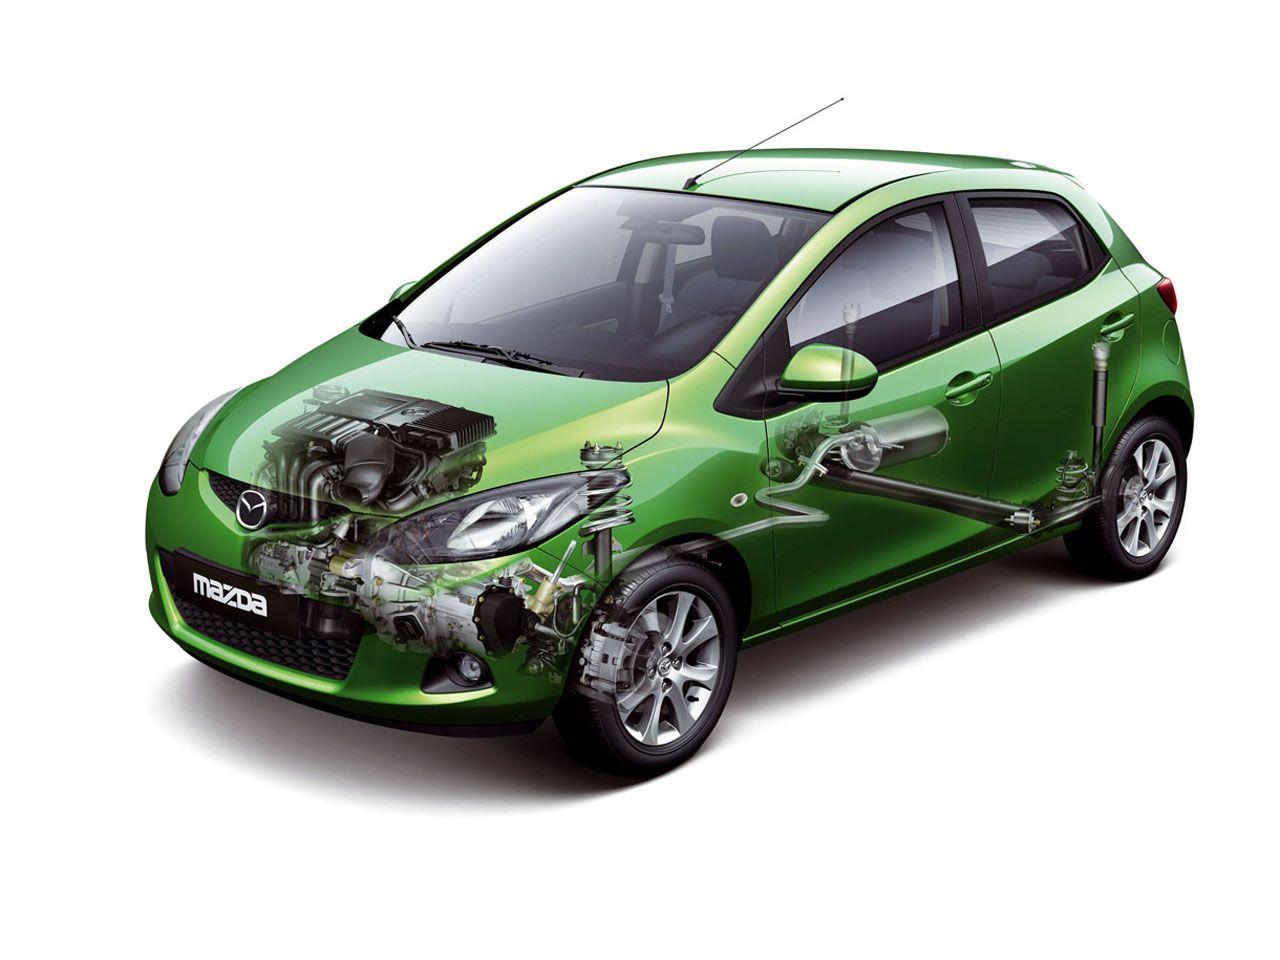 Mazda 2 Showing Engine Wallpaper 1280x960